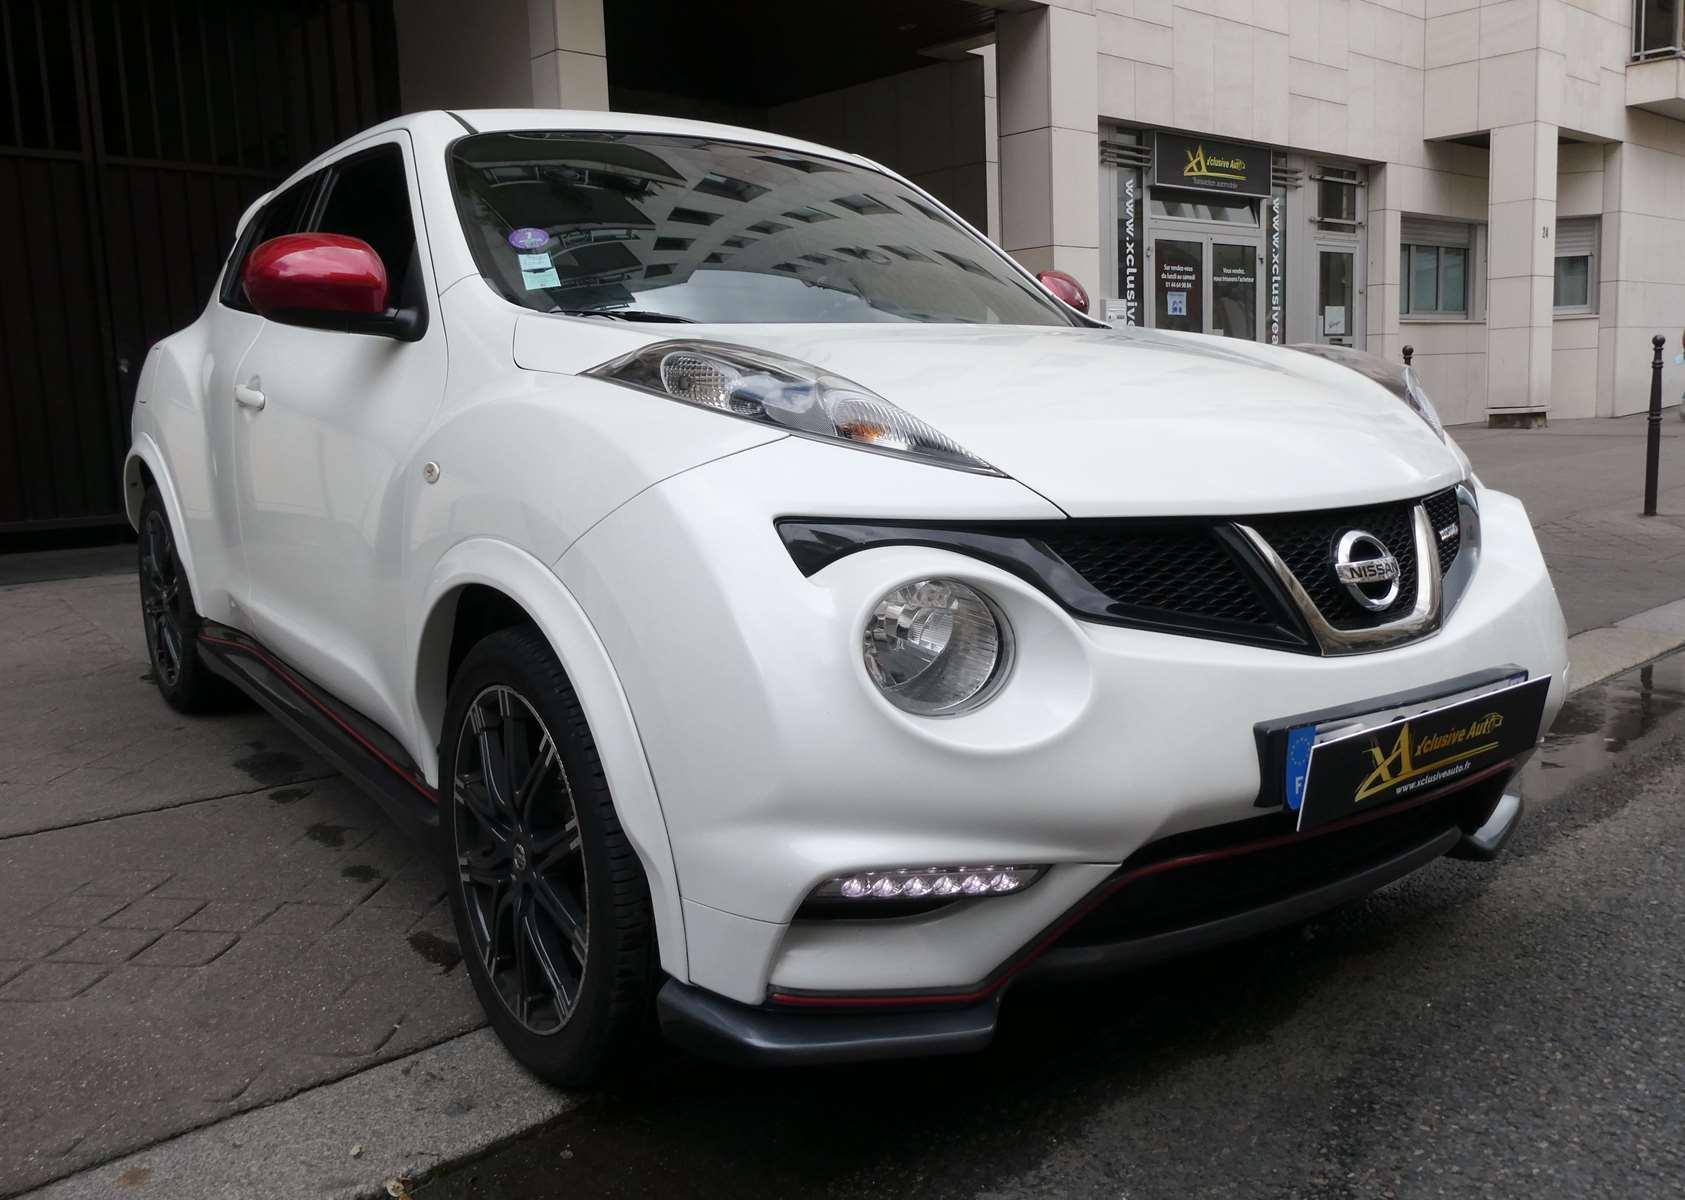 Nissan juke 1.6 dig-t 200 nismo 4×4 cvt